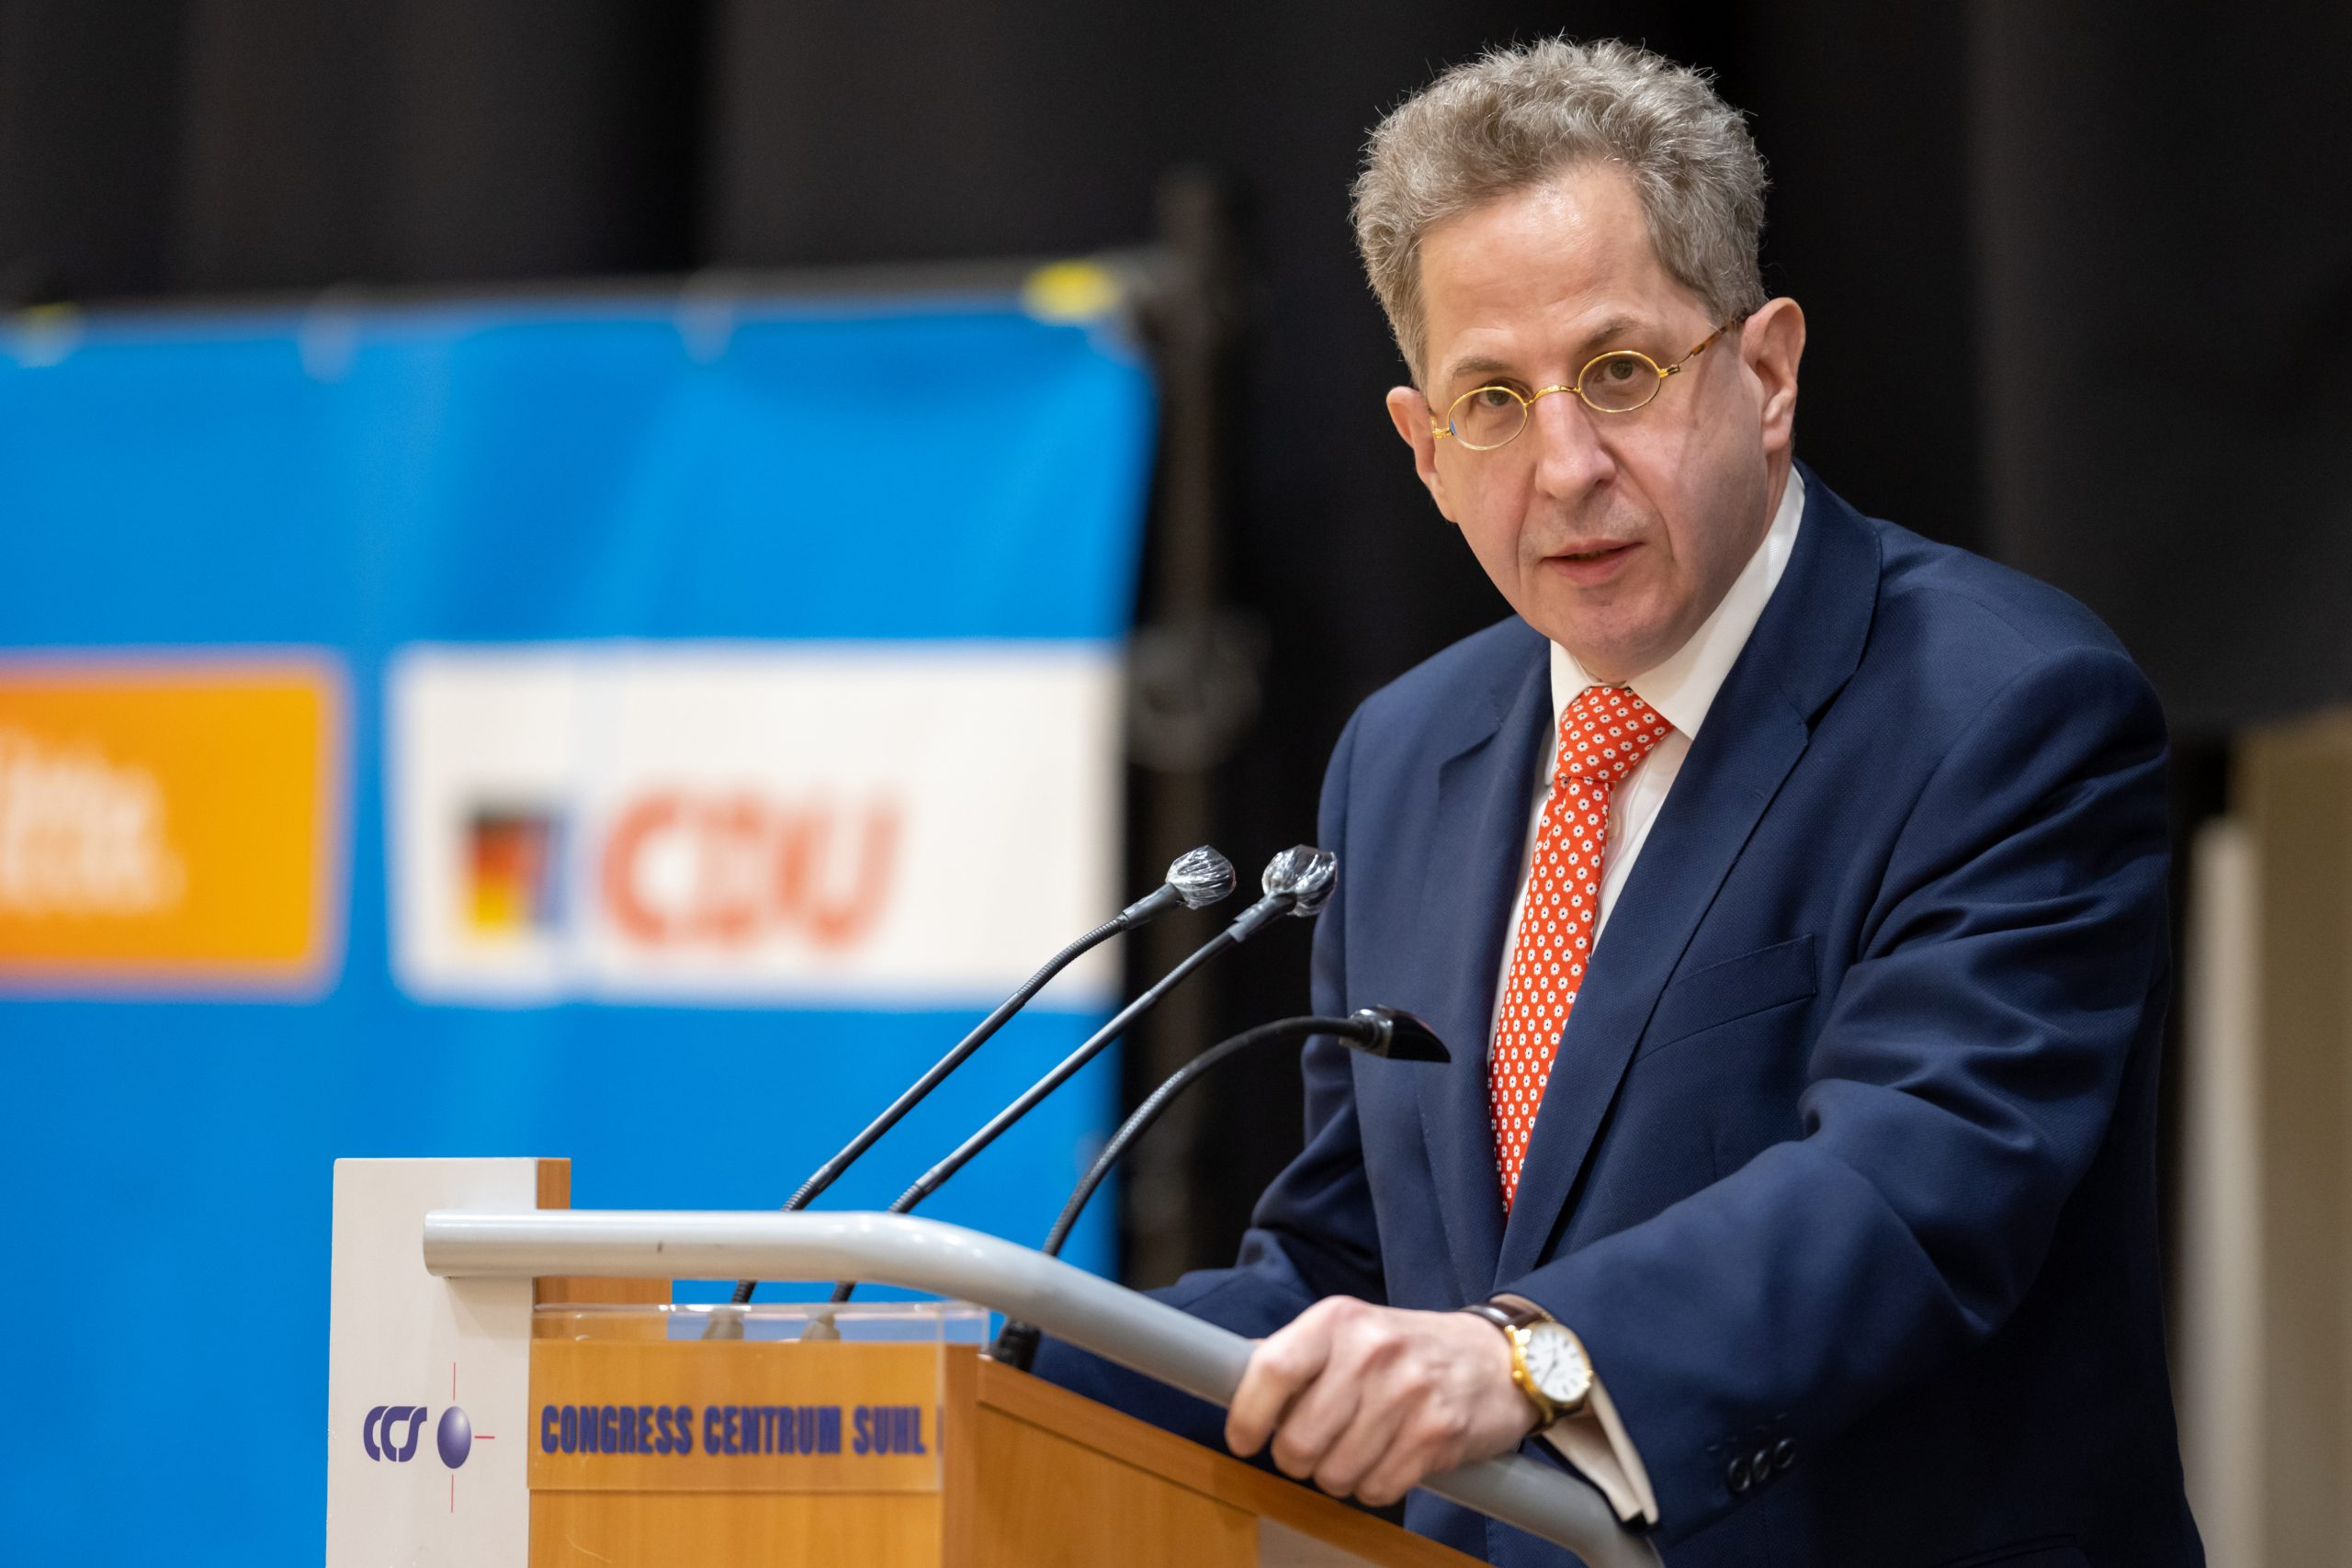 Hans-Georg Maaßen tritt im Südthüringer Wahlkreis 196 an.